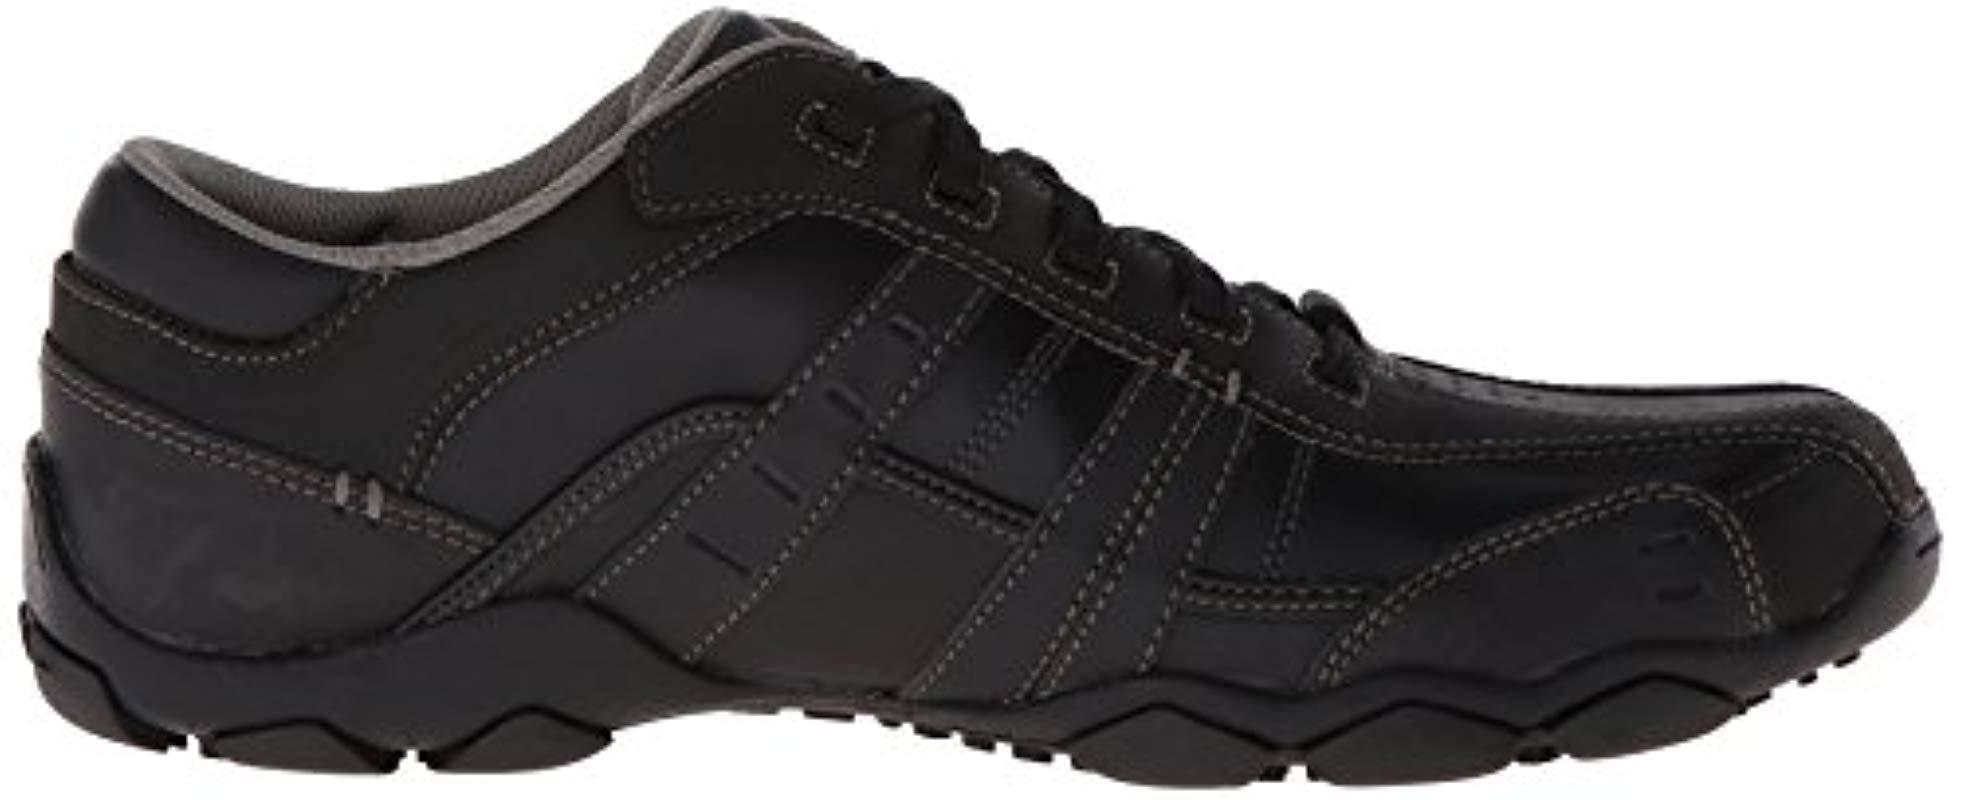 skechers men's vassell casual shoe- black/brown